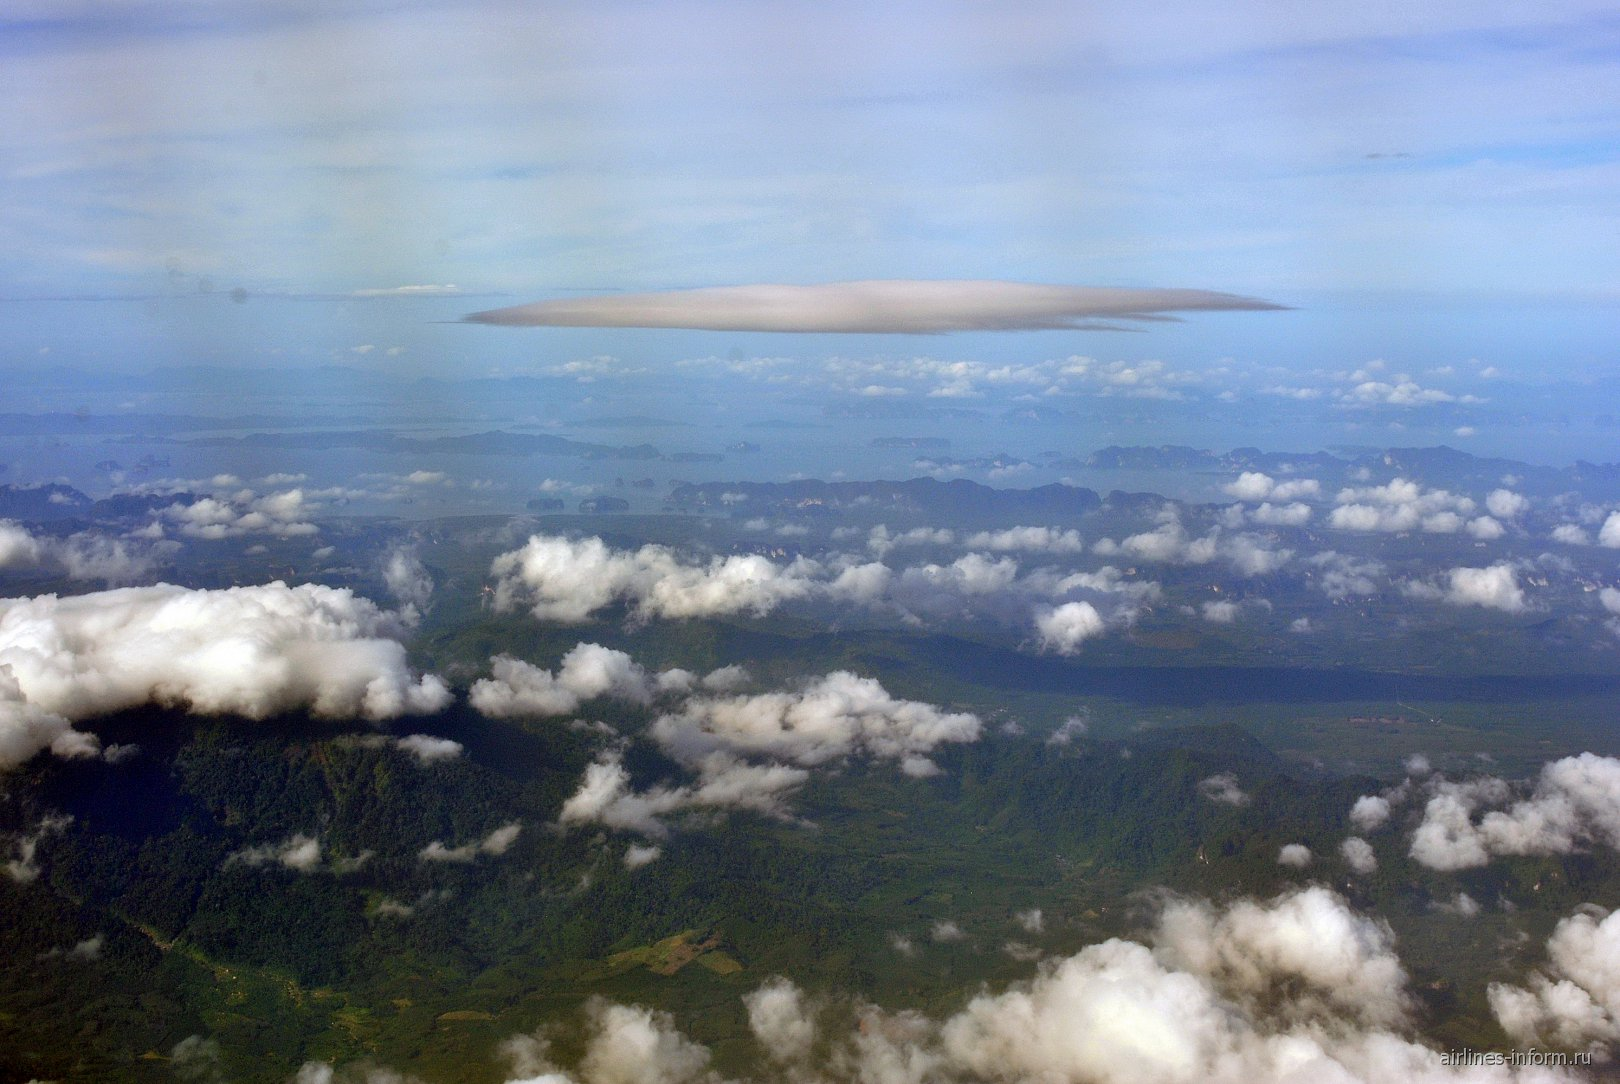 Провинция Краби и Адаманское море в Таиланде